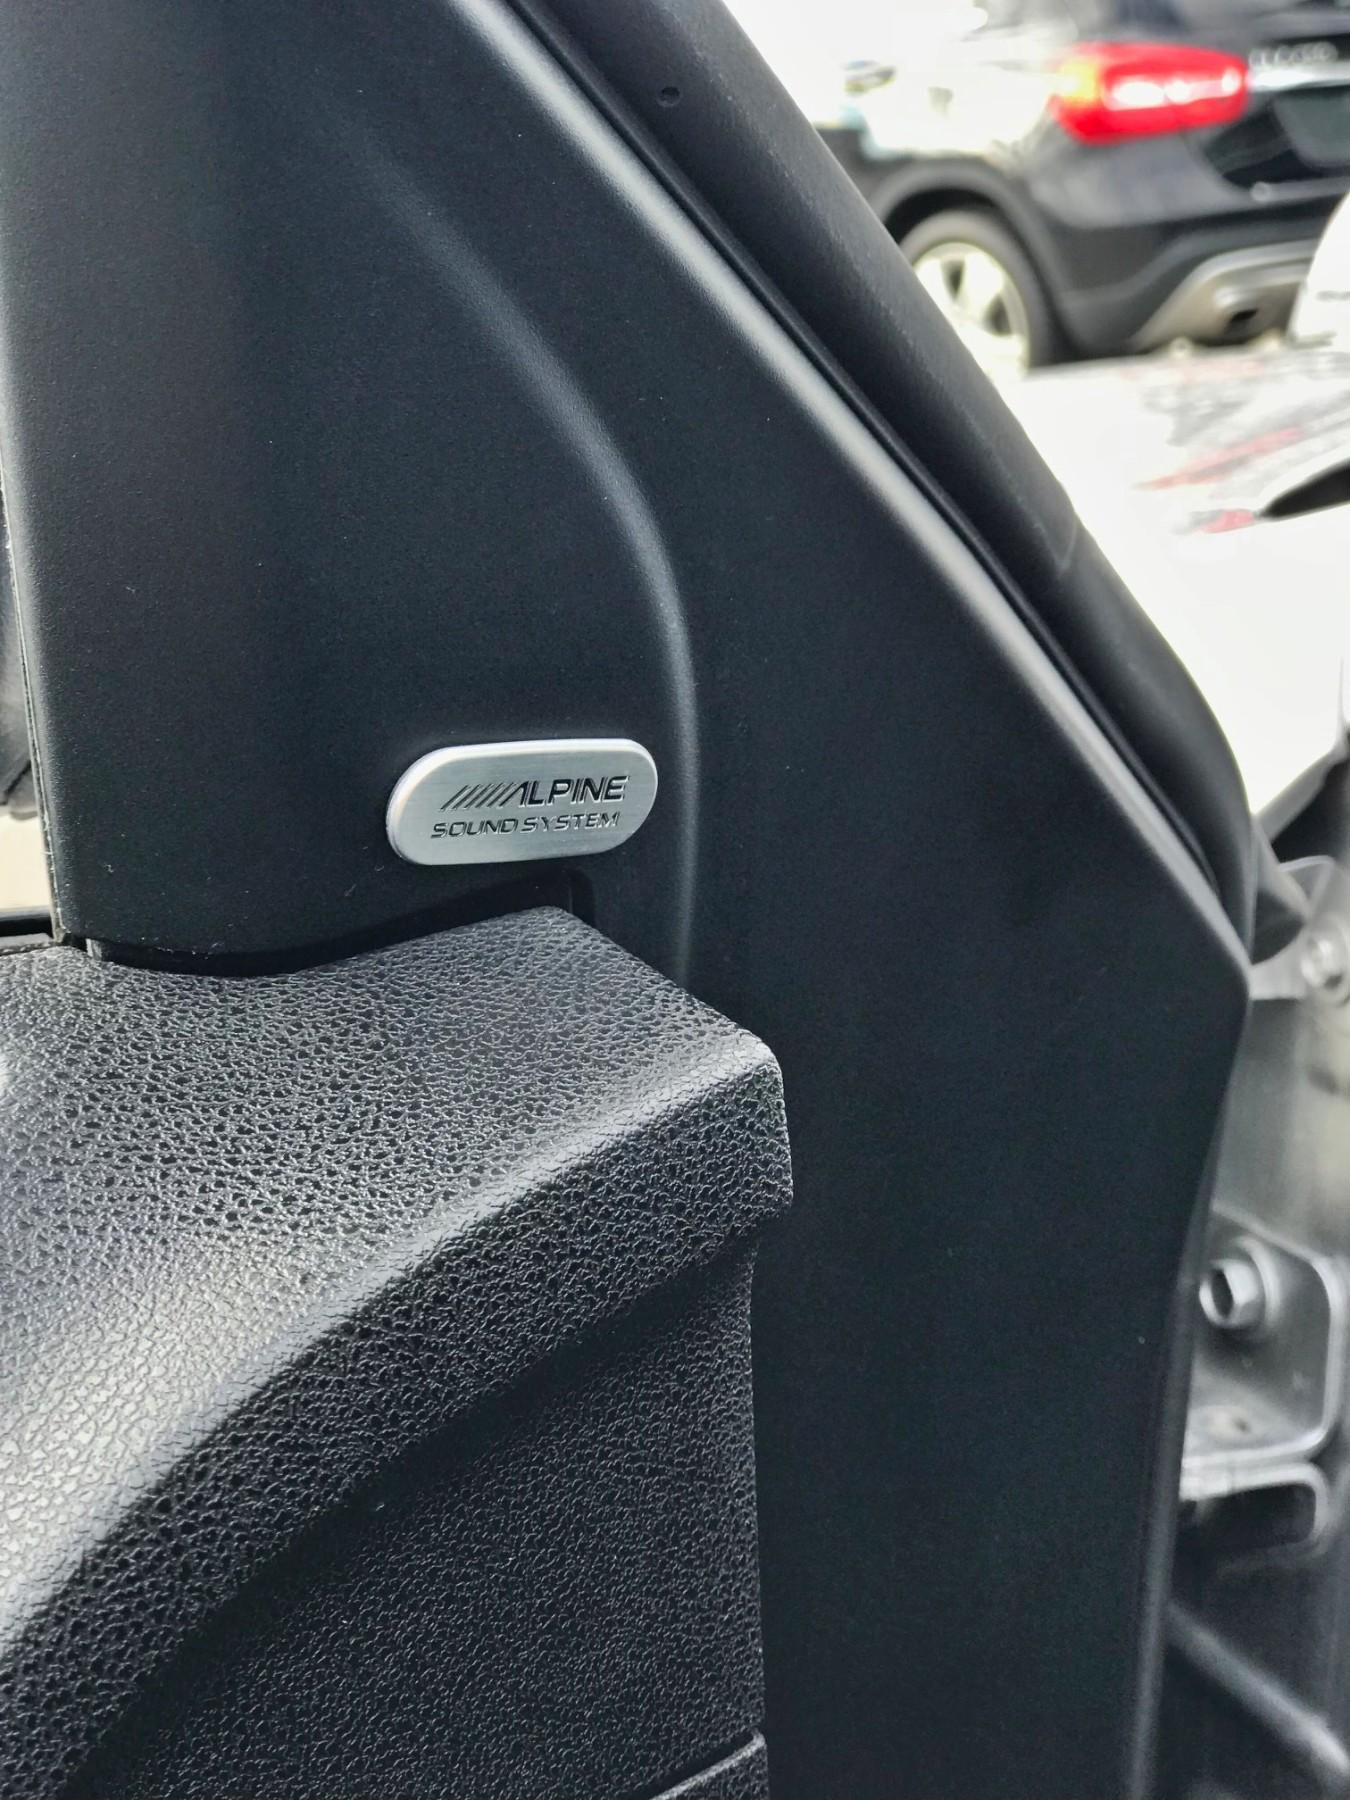 2016 Chrysler 300C Base (Stk: APR1432) in Mississauga - Image 6 of 17